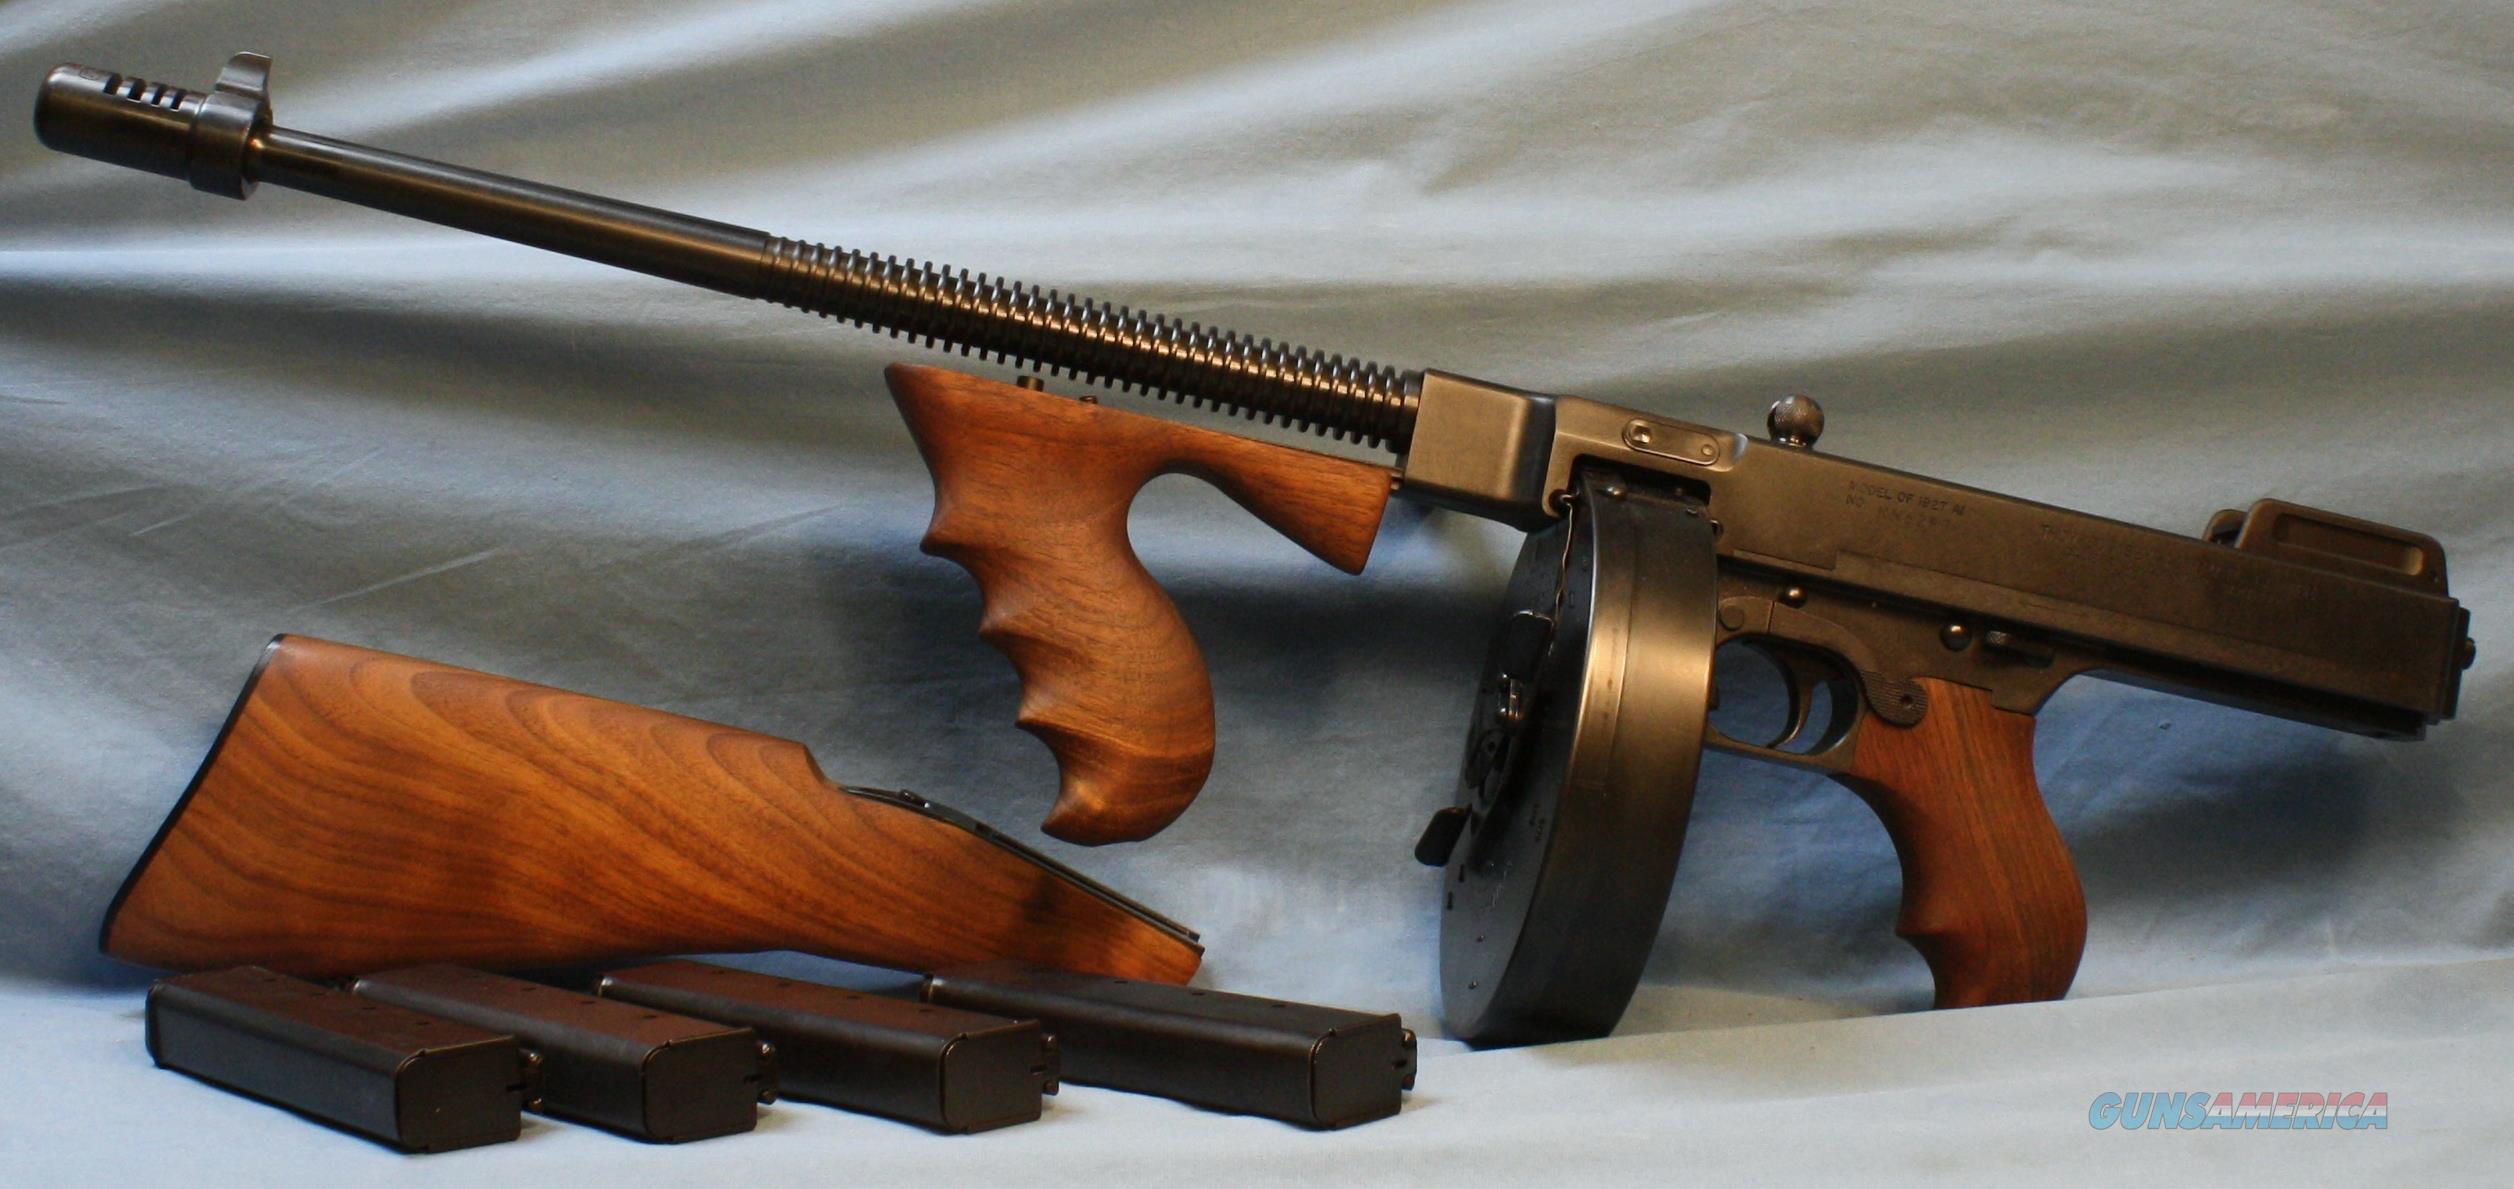 0d90a2c2eab714 Thompson Auto-Ordnance 1927A1 Deluxe Semi-Automatic Carbine Detachable  Stock with FBI Case 45